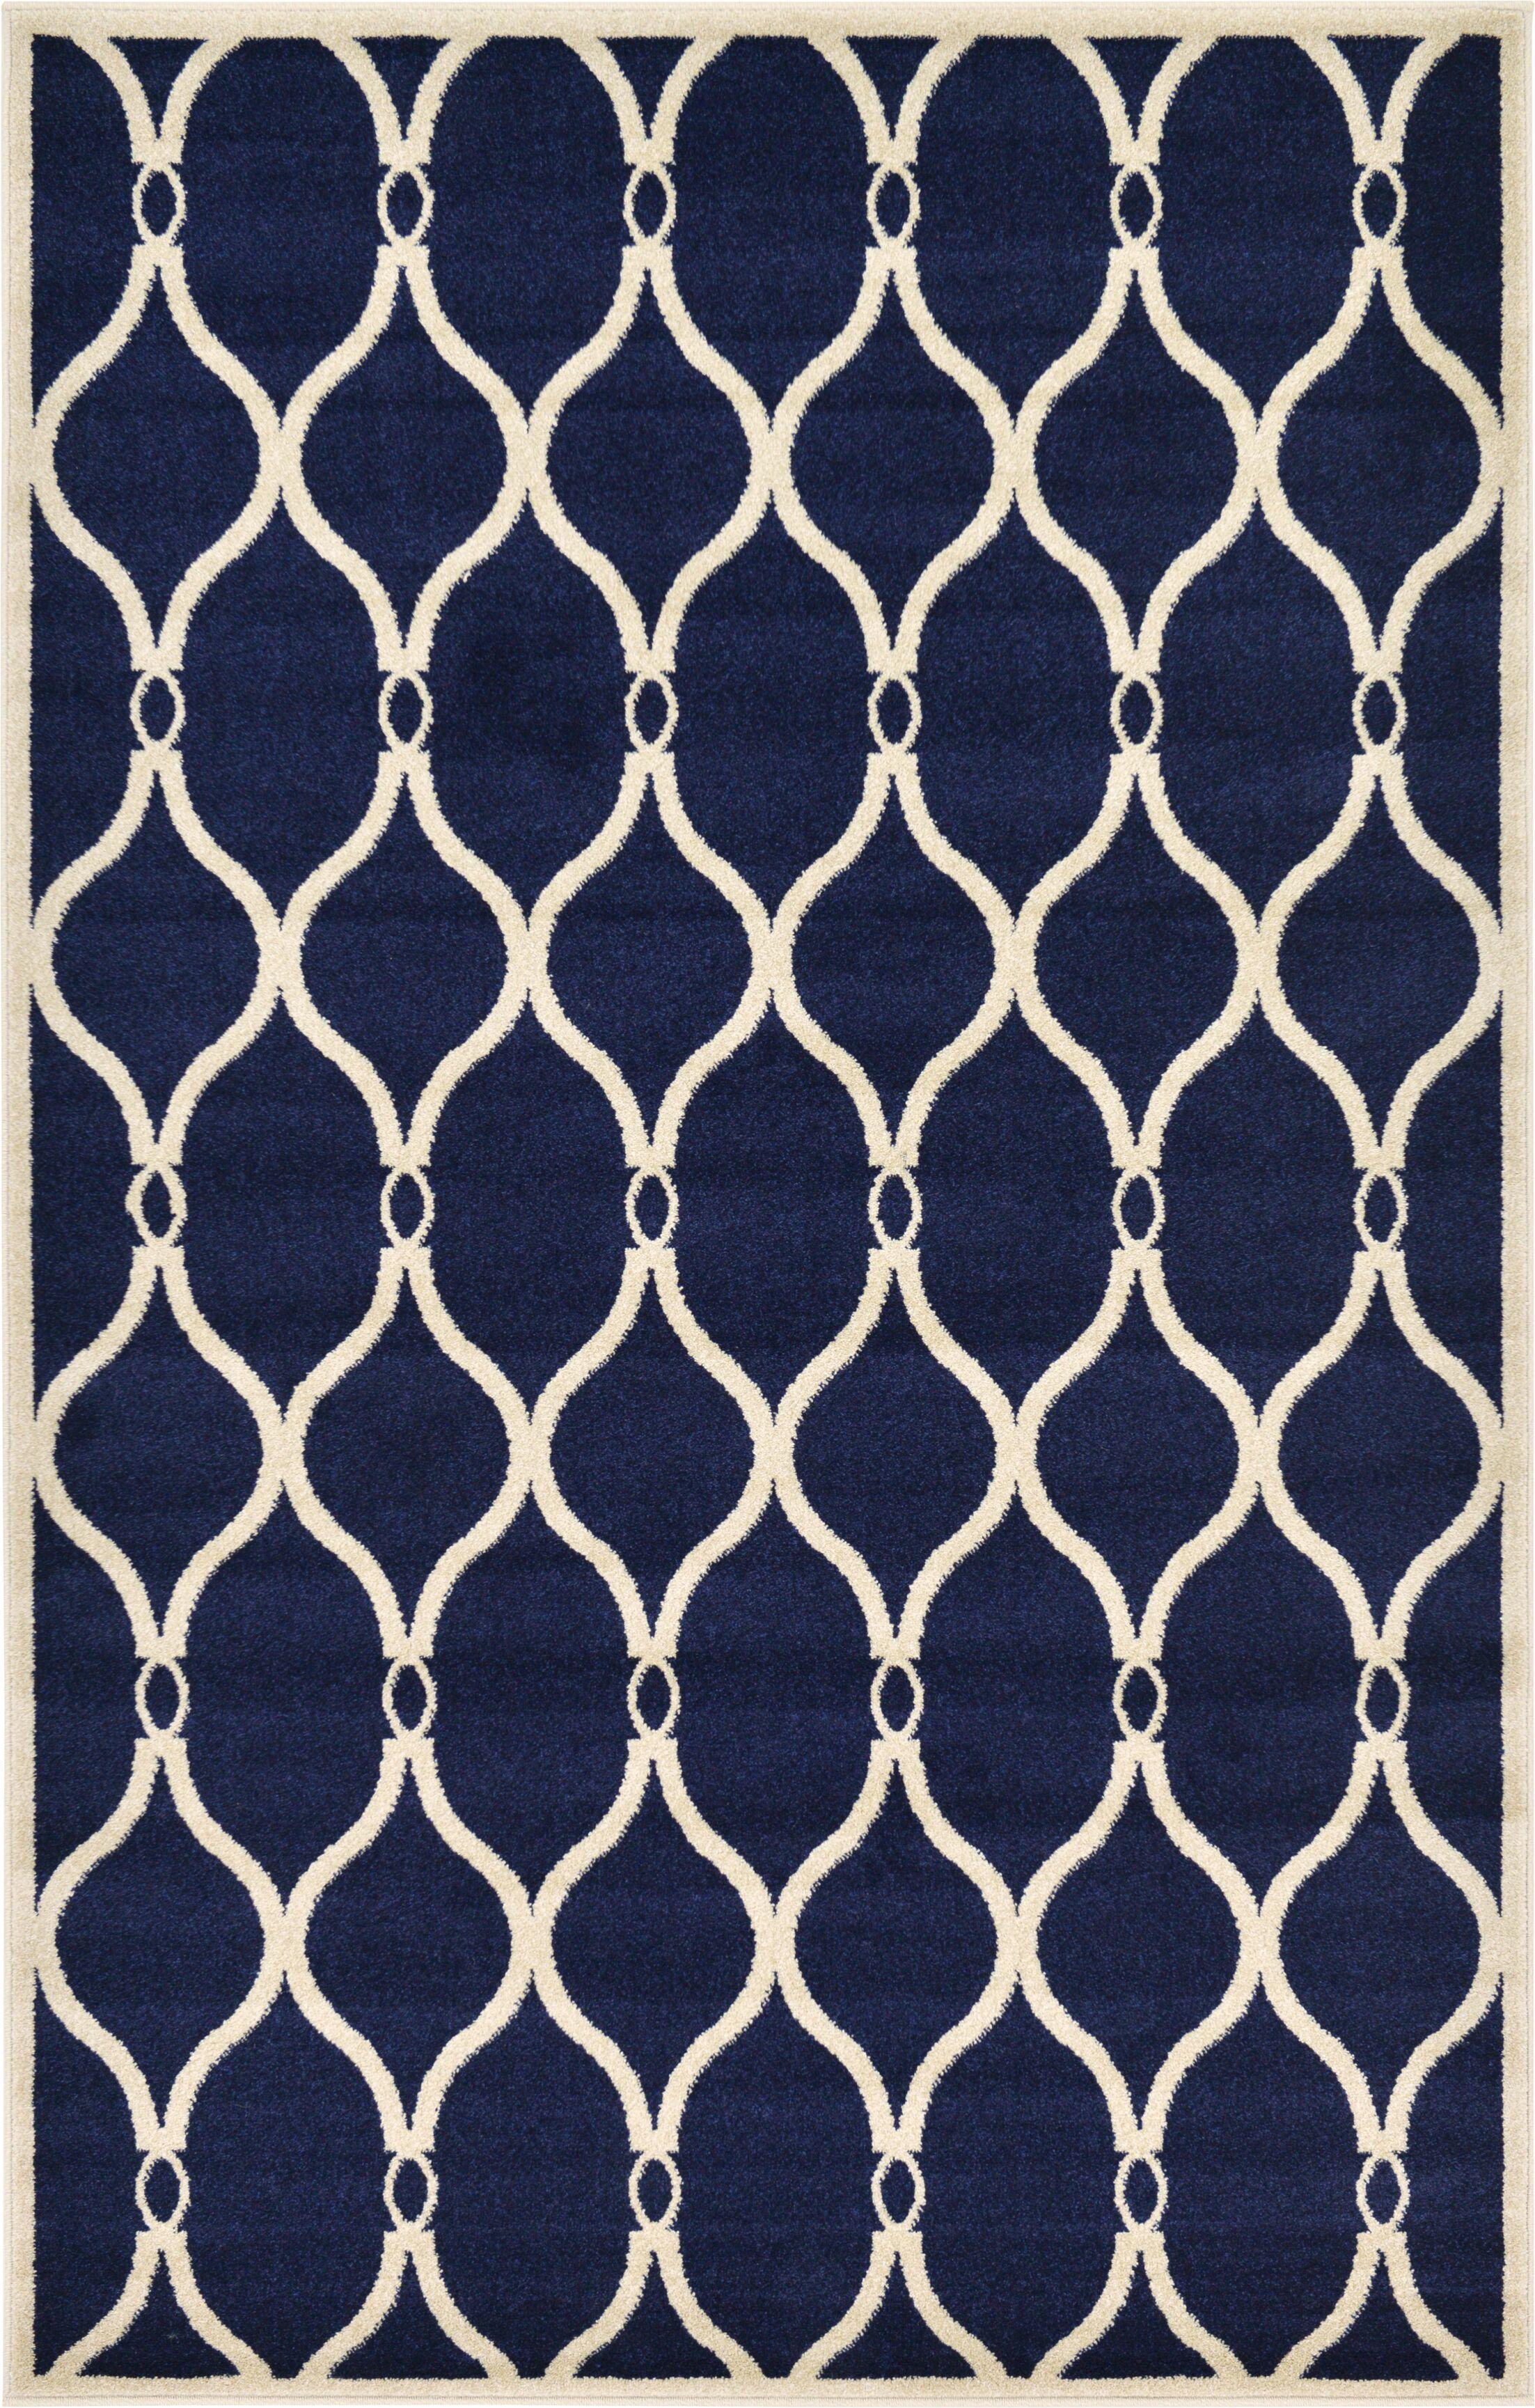 Molly Navy Blue Area Rug Rug Size: Rectangle 5' x 8'